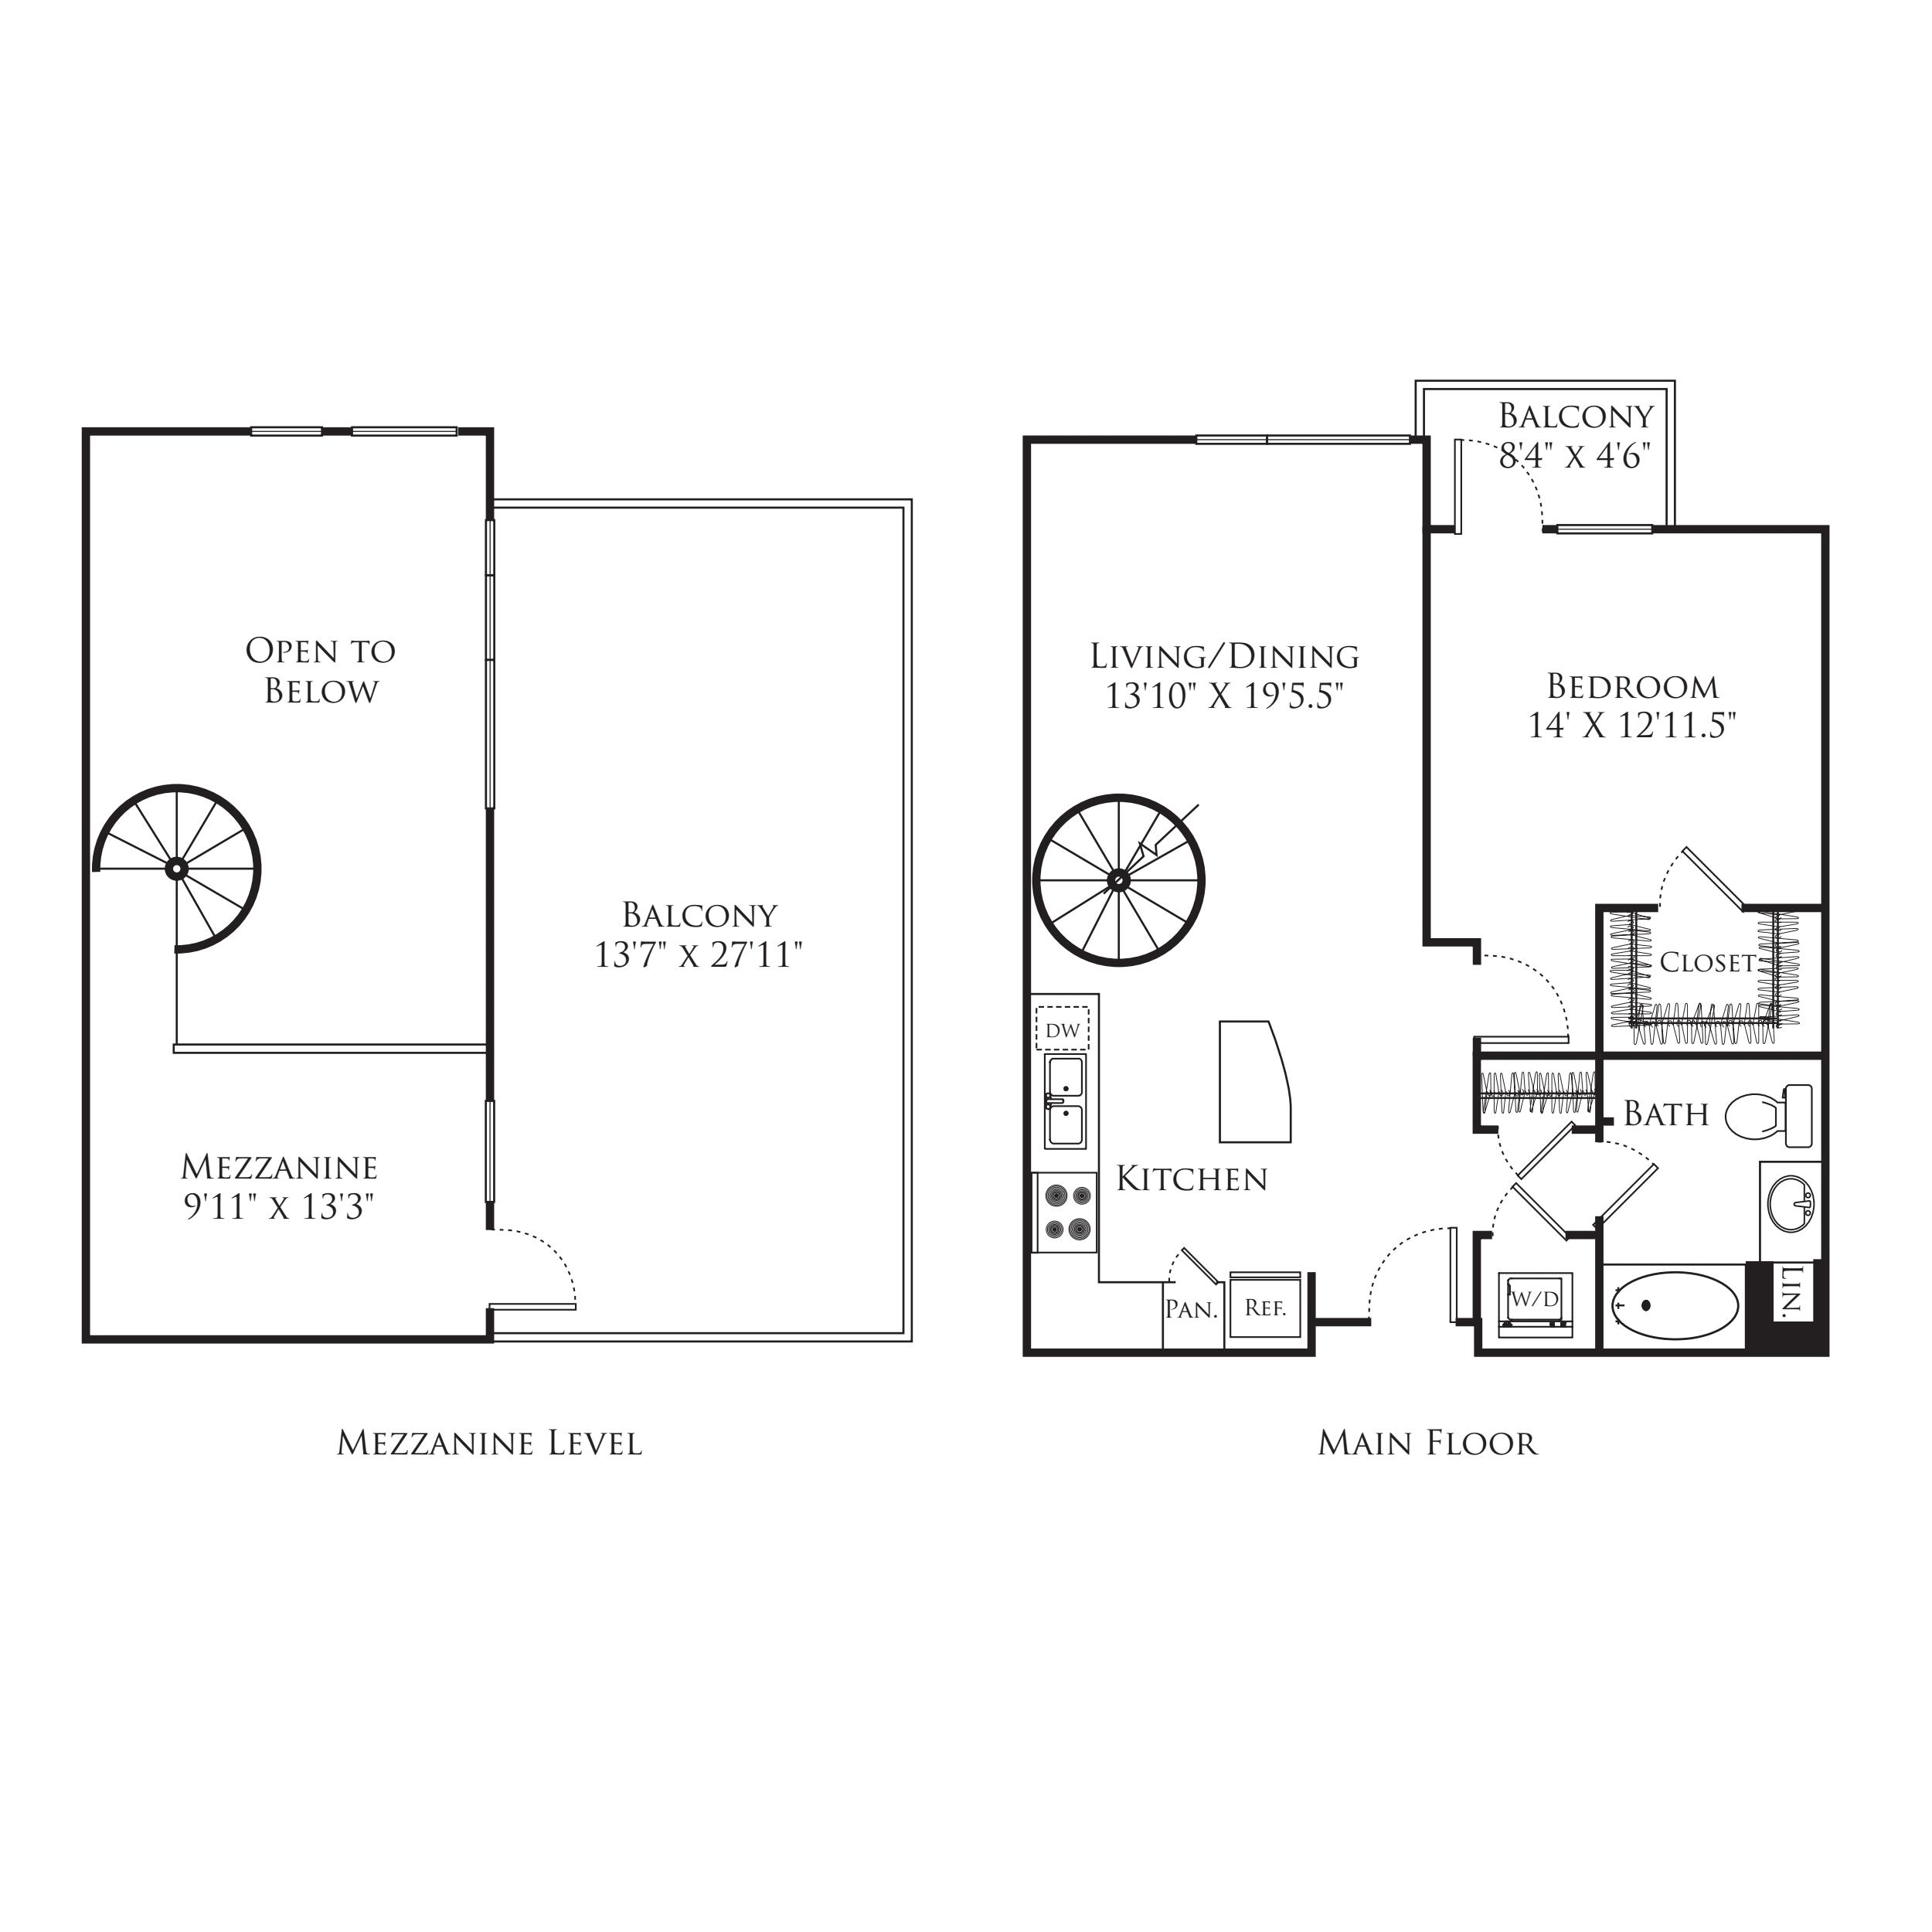 1 Bedroom MF